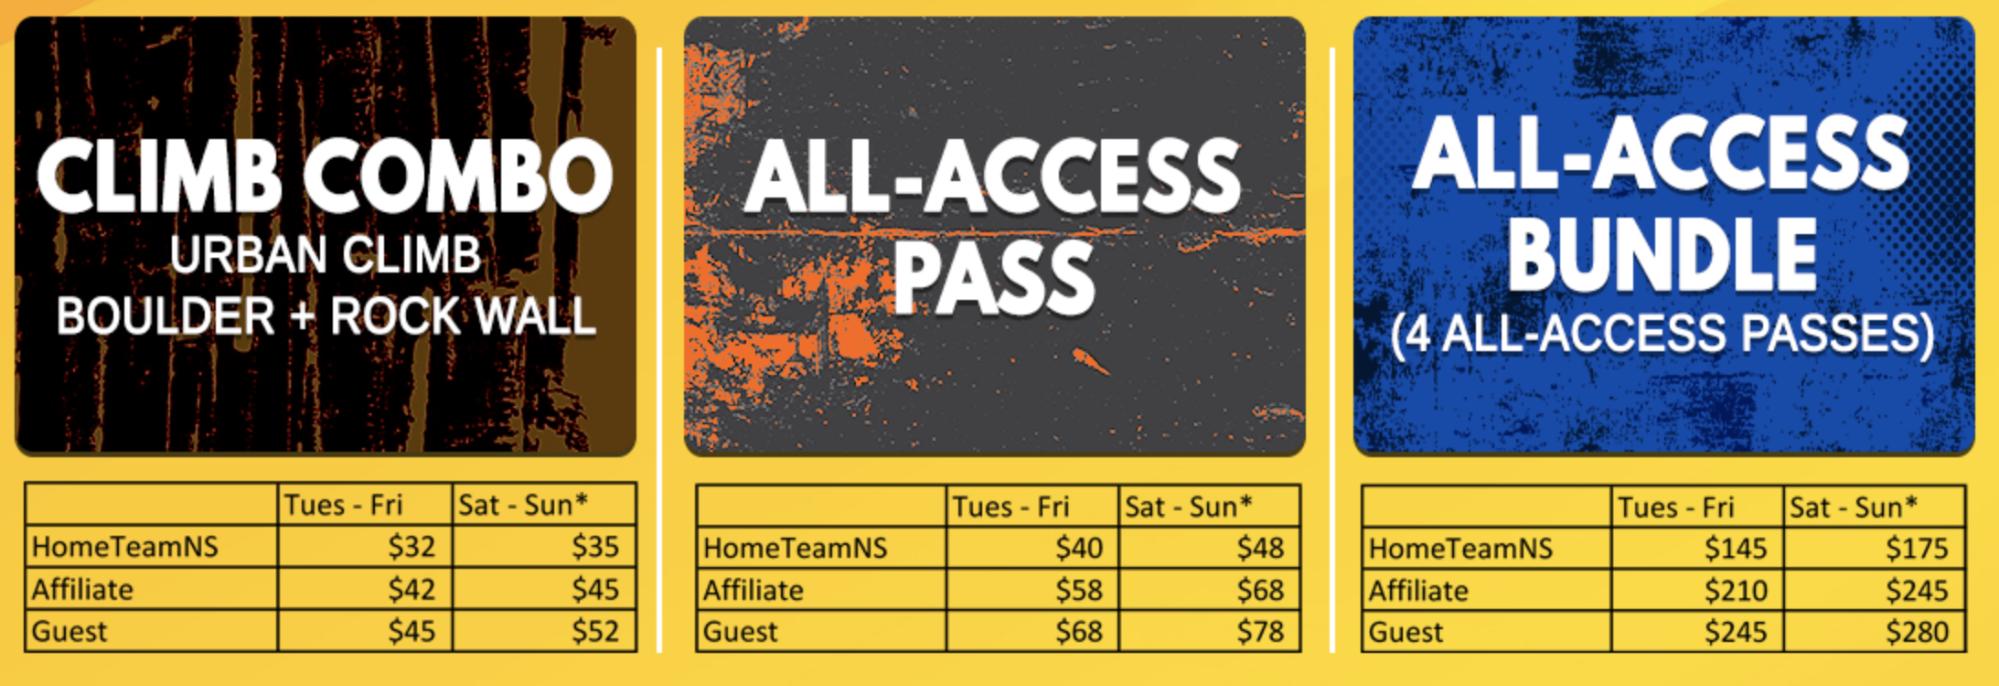 HomeTeamNS.- Adventure HQ prices